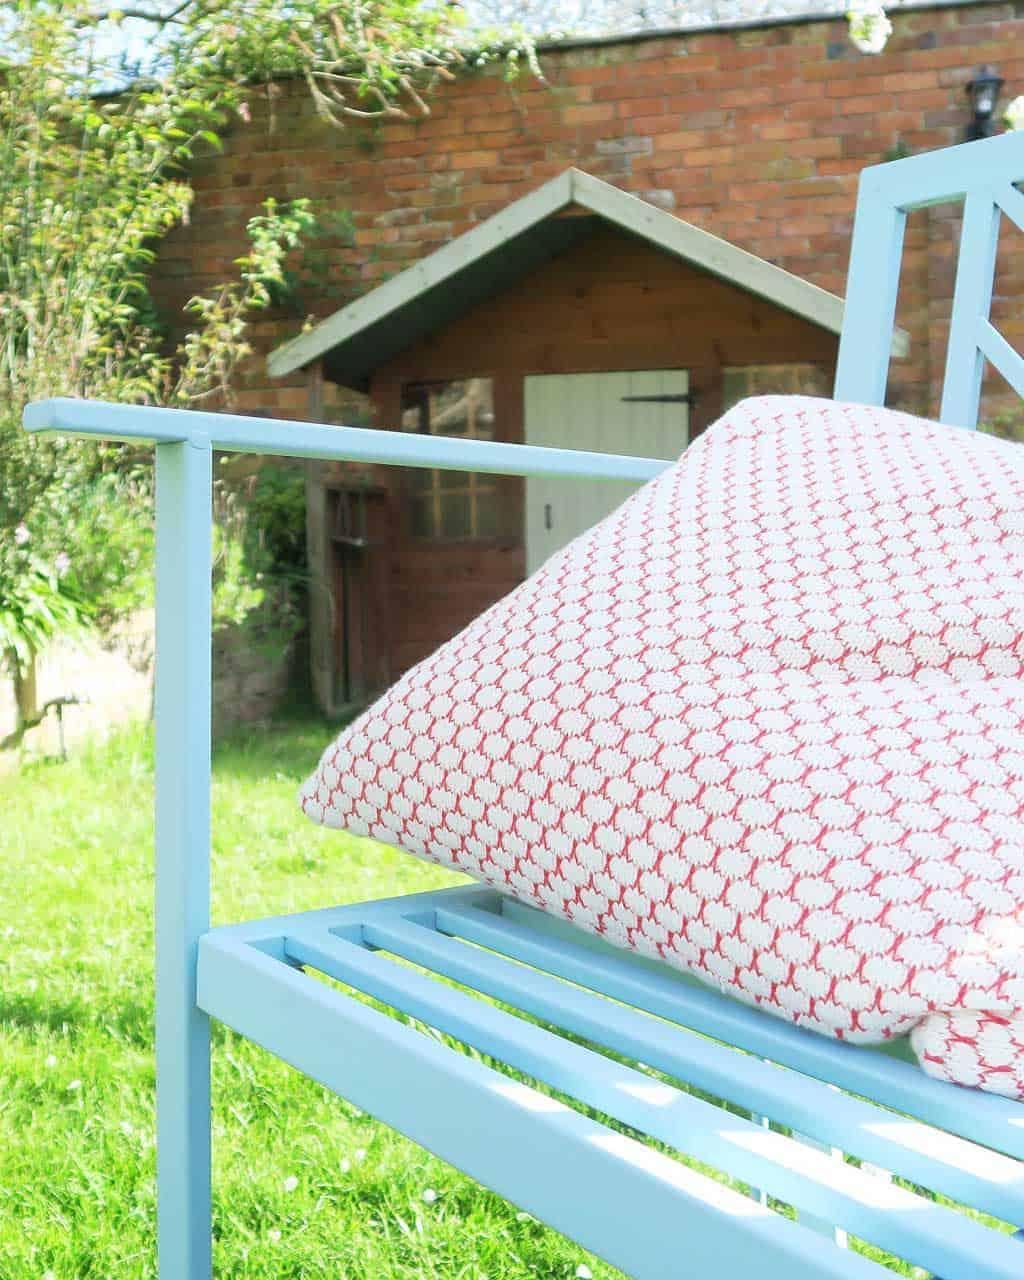 HomeSense garden bench and cushion